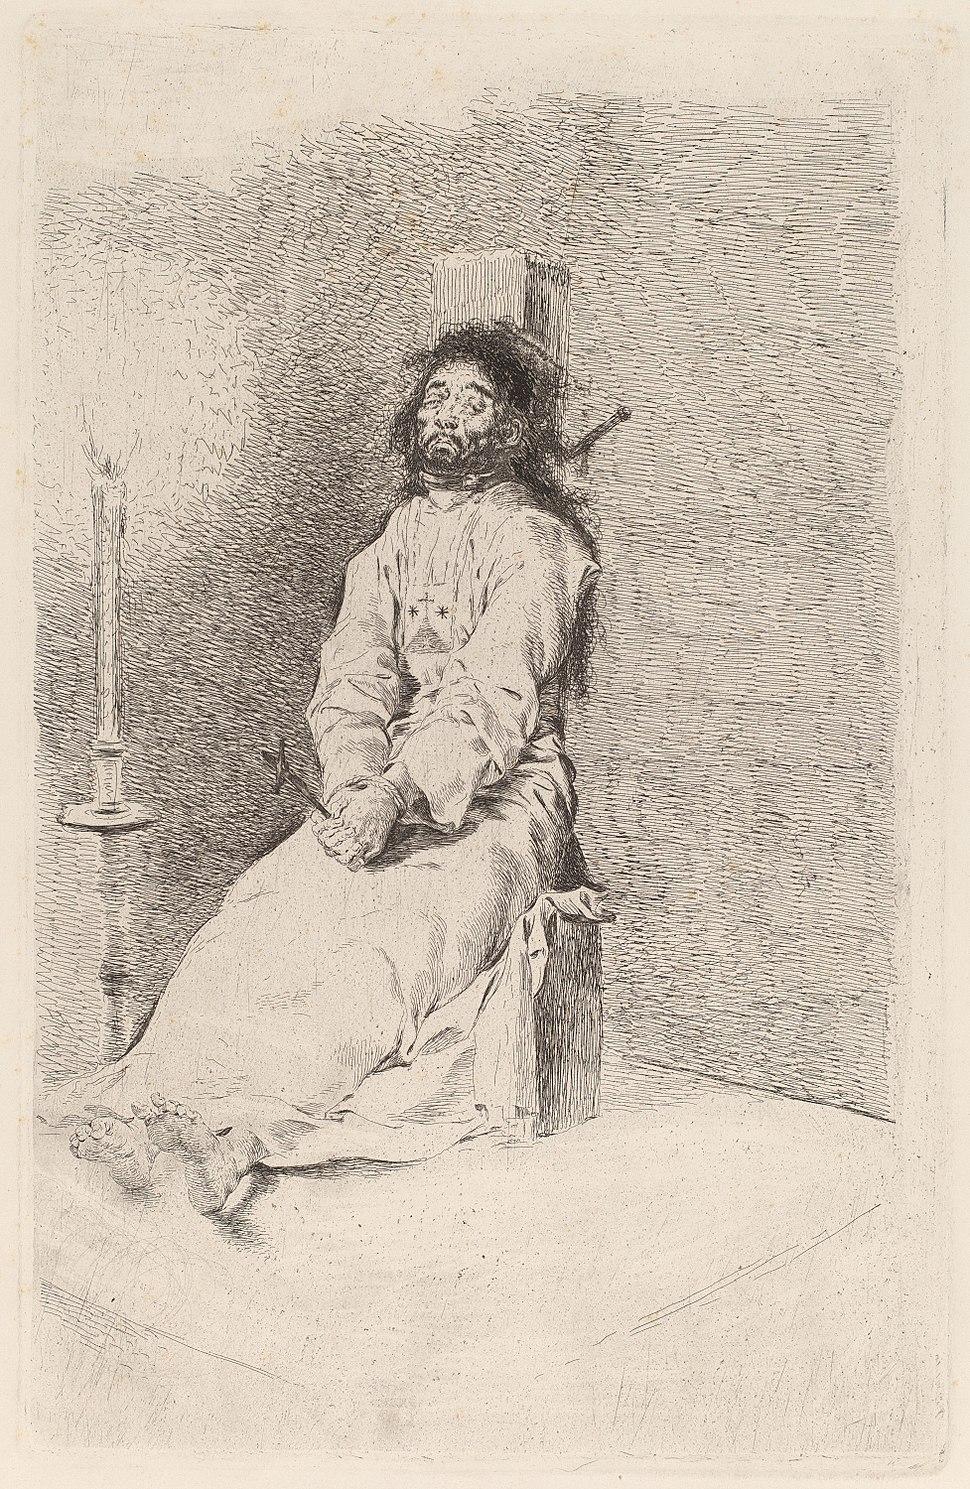 Goya - The Garroted Man